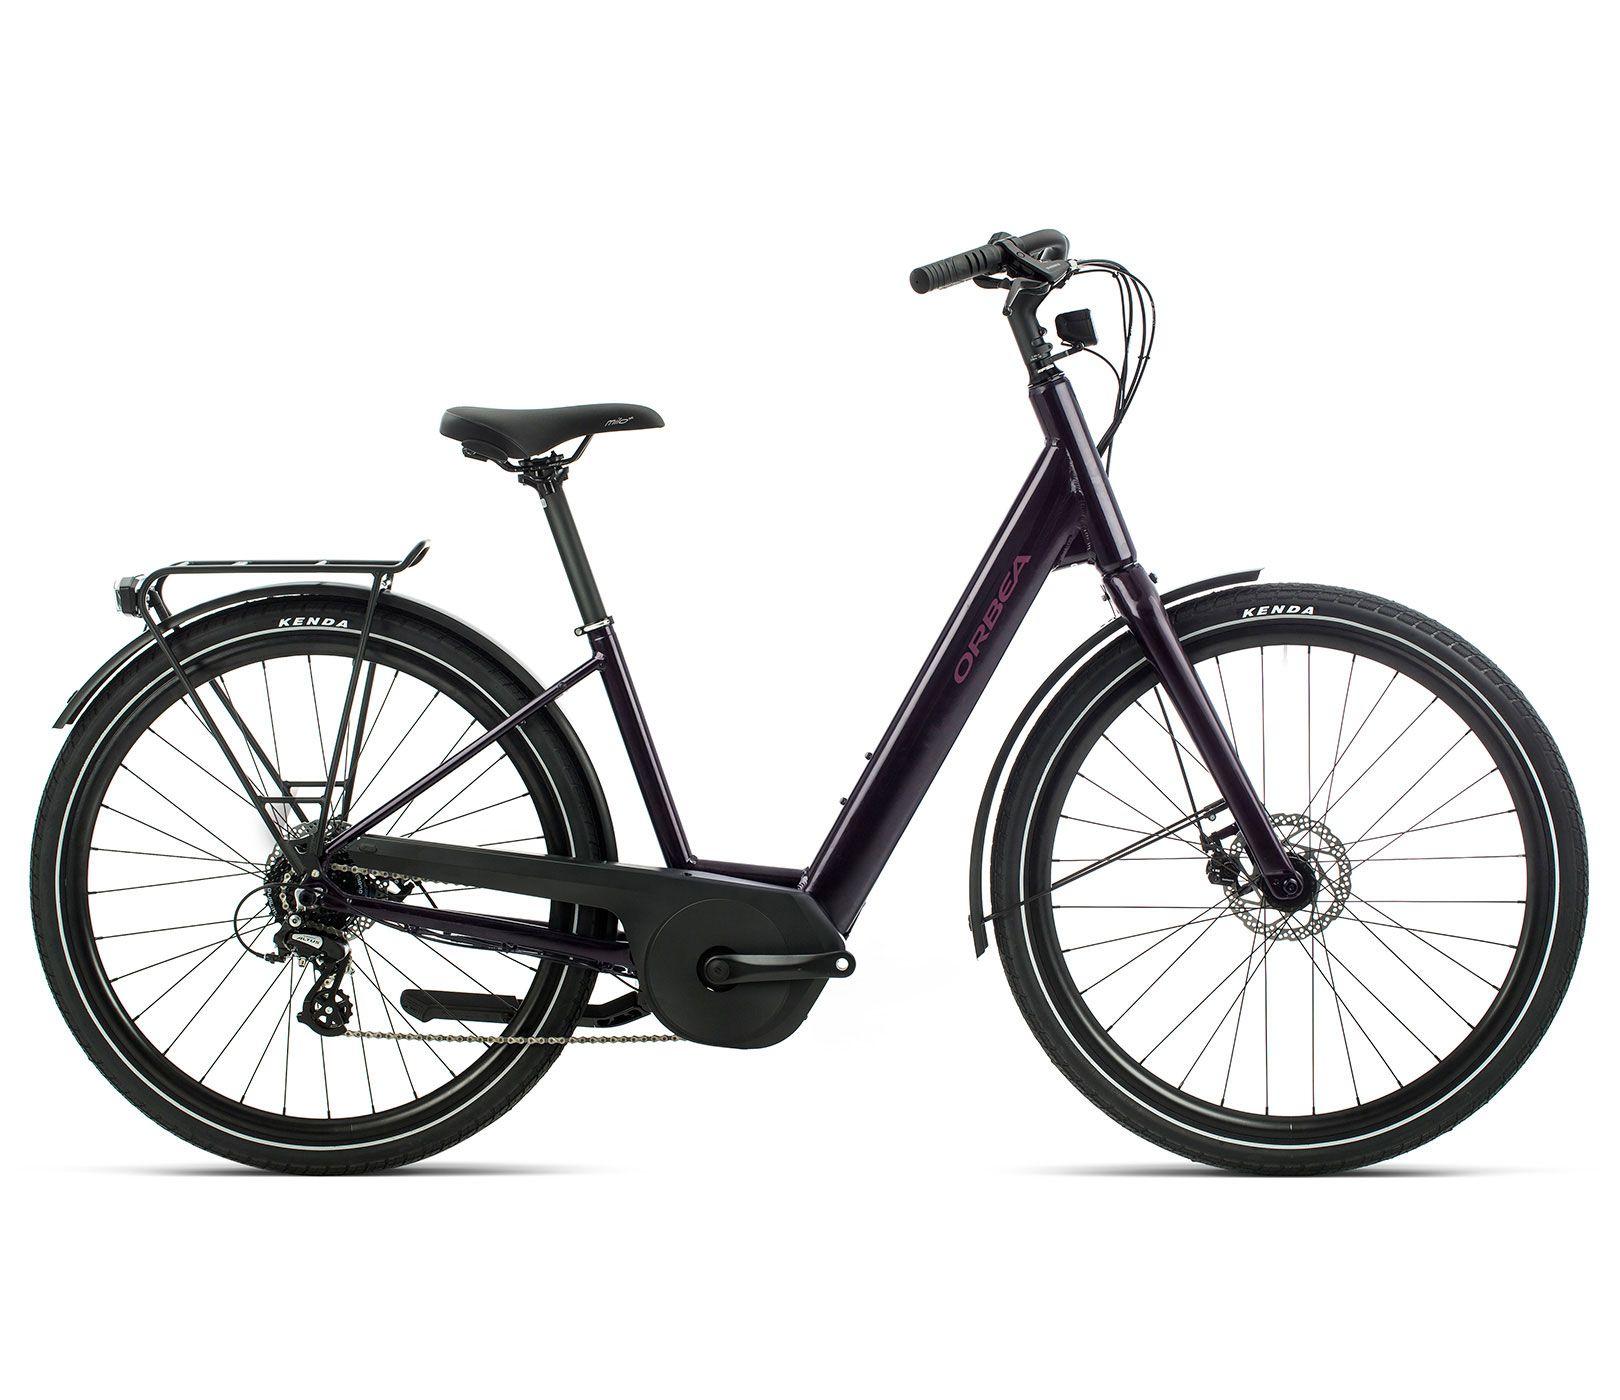 Bicicleta URBANA E-BIKE Orbea Optima E50, Tam M, Violeta - 2020